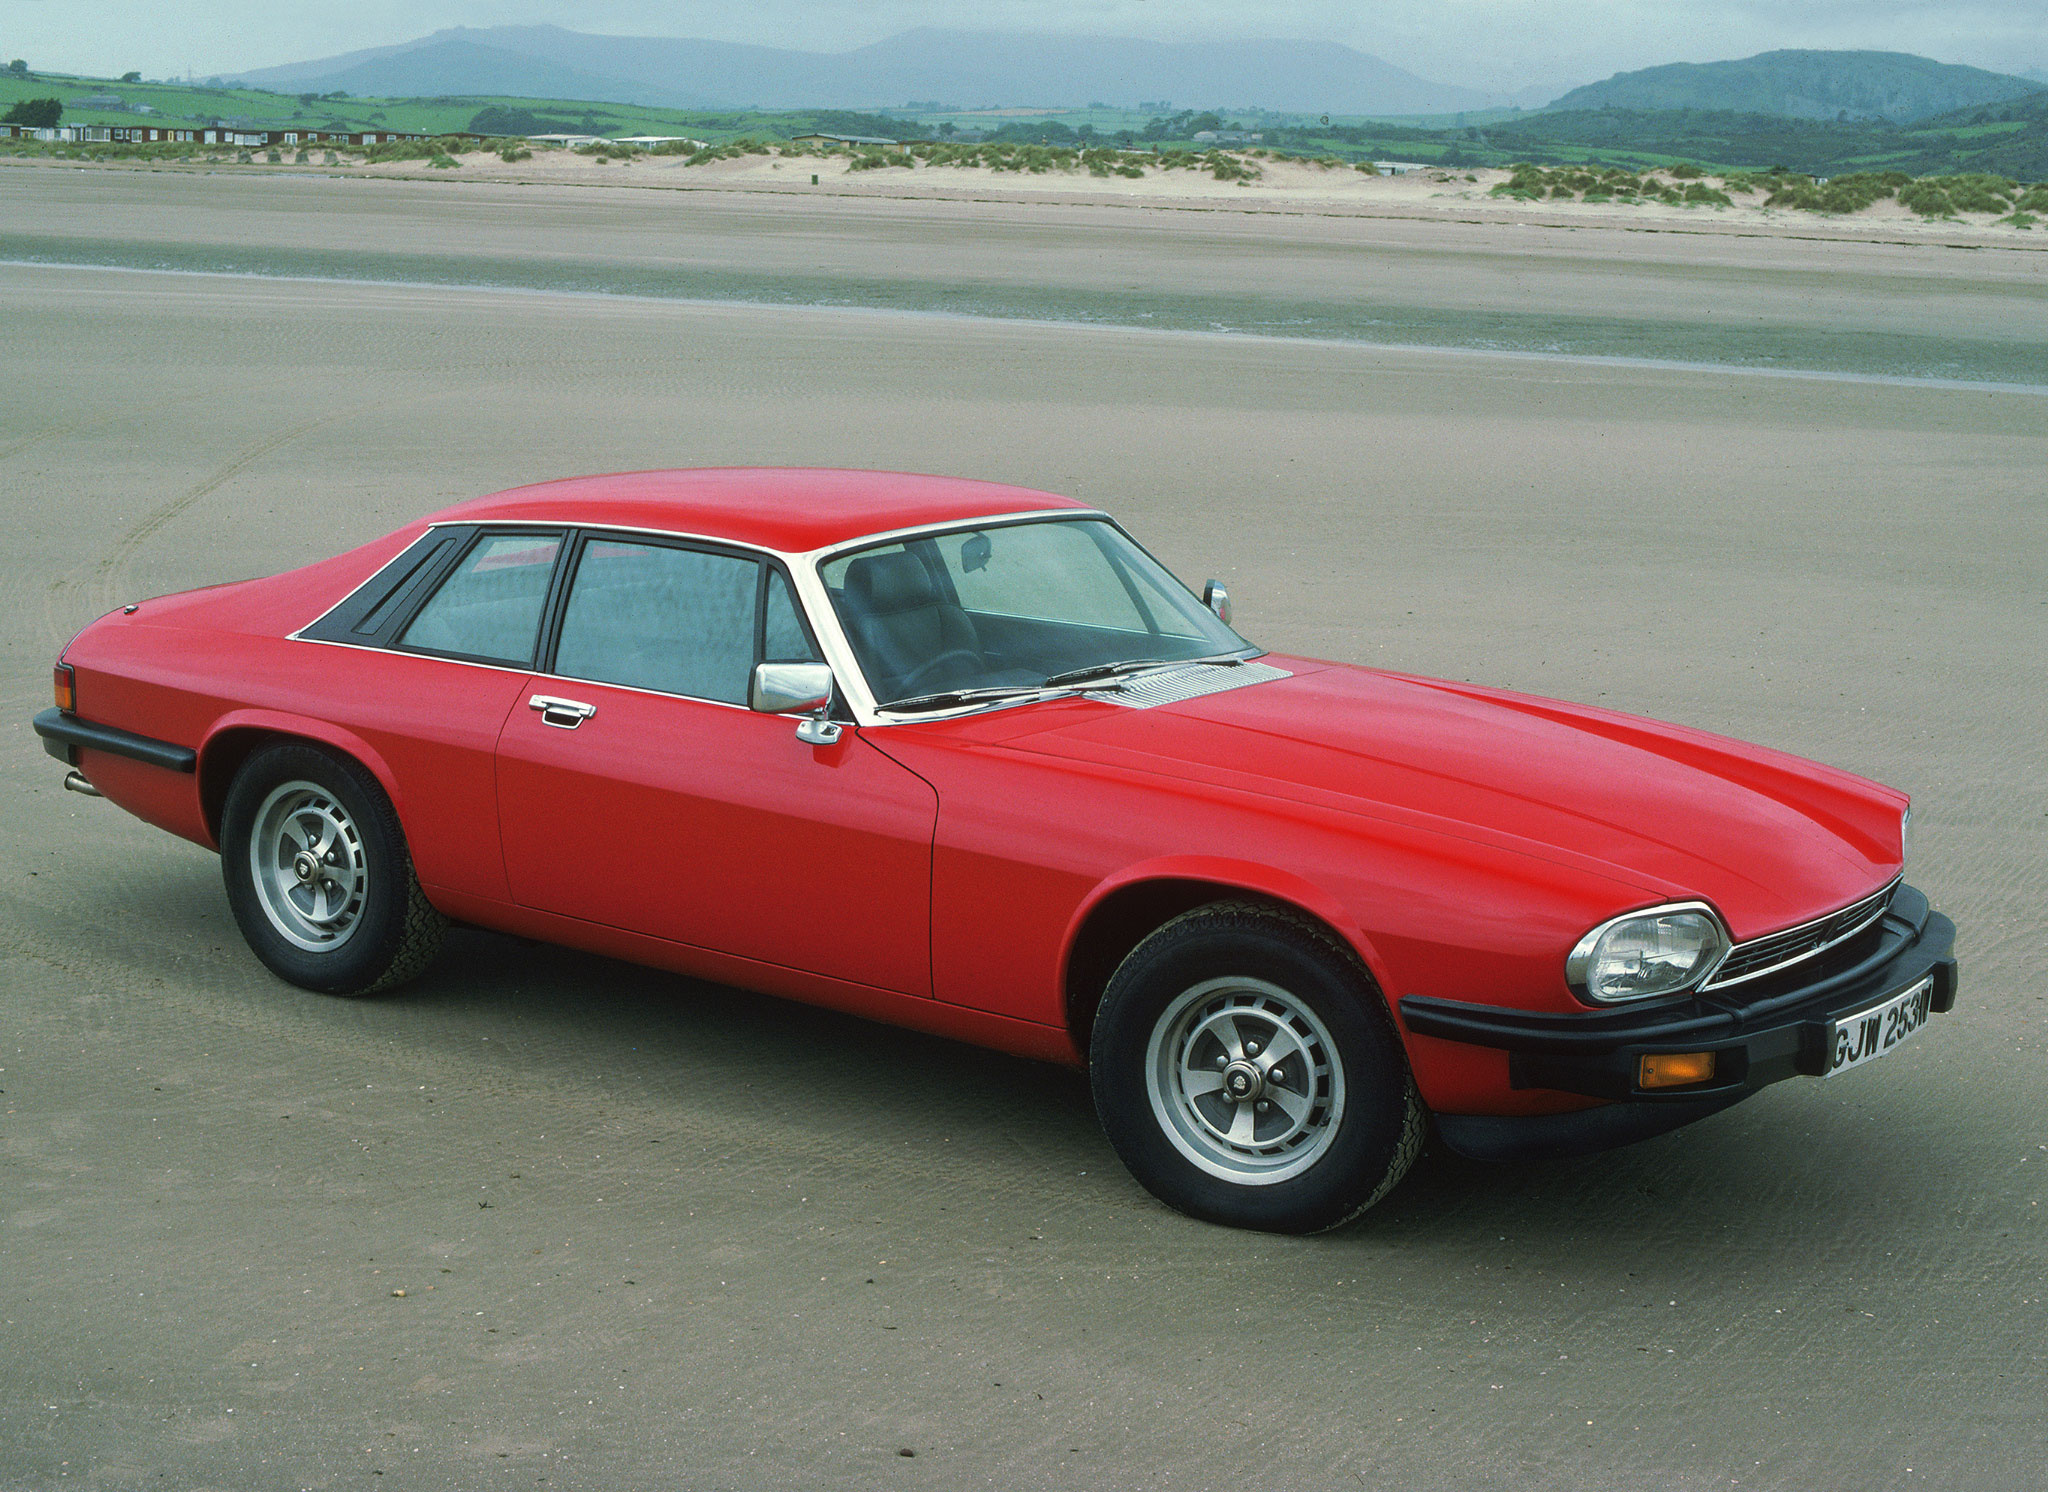 1975 Jaguar XJ-S